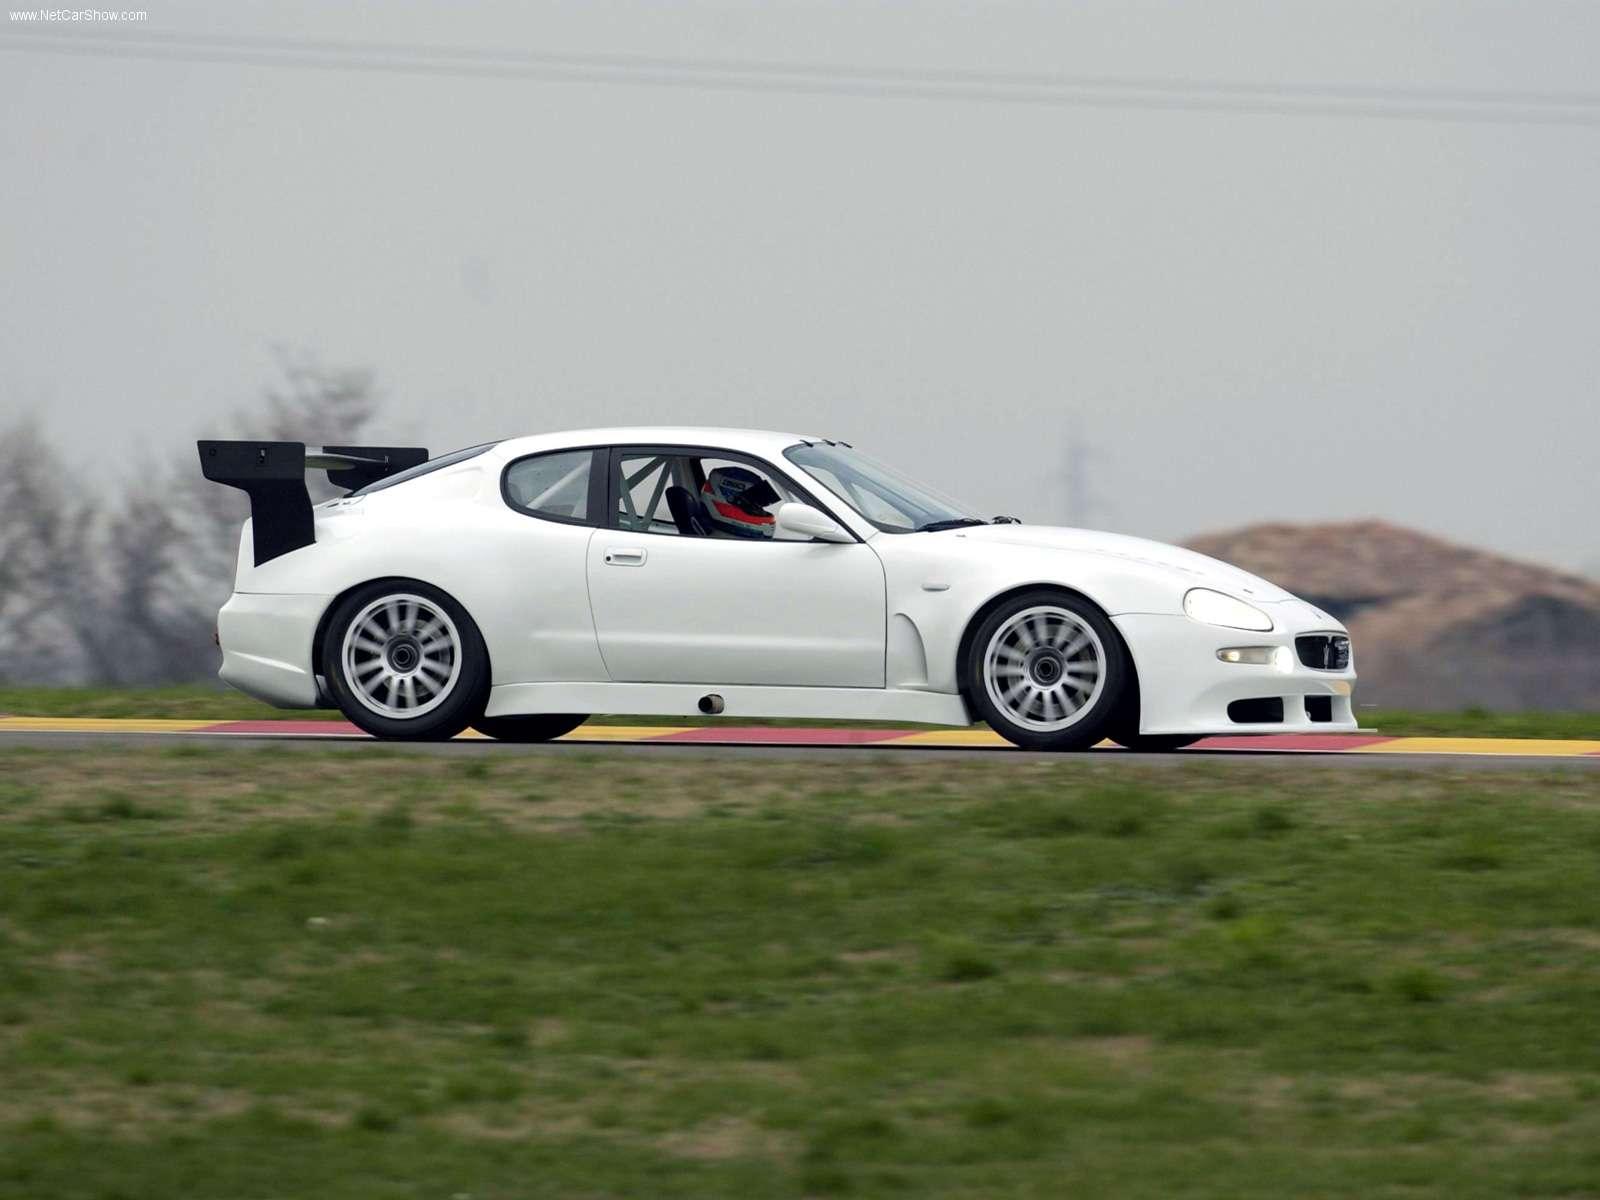 Hình ảnh siêu xe Maserati Trofeo Light 2003 & nội ngoại thất